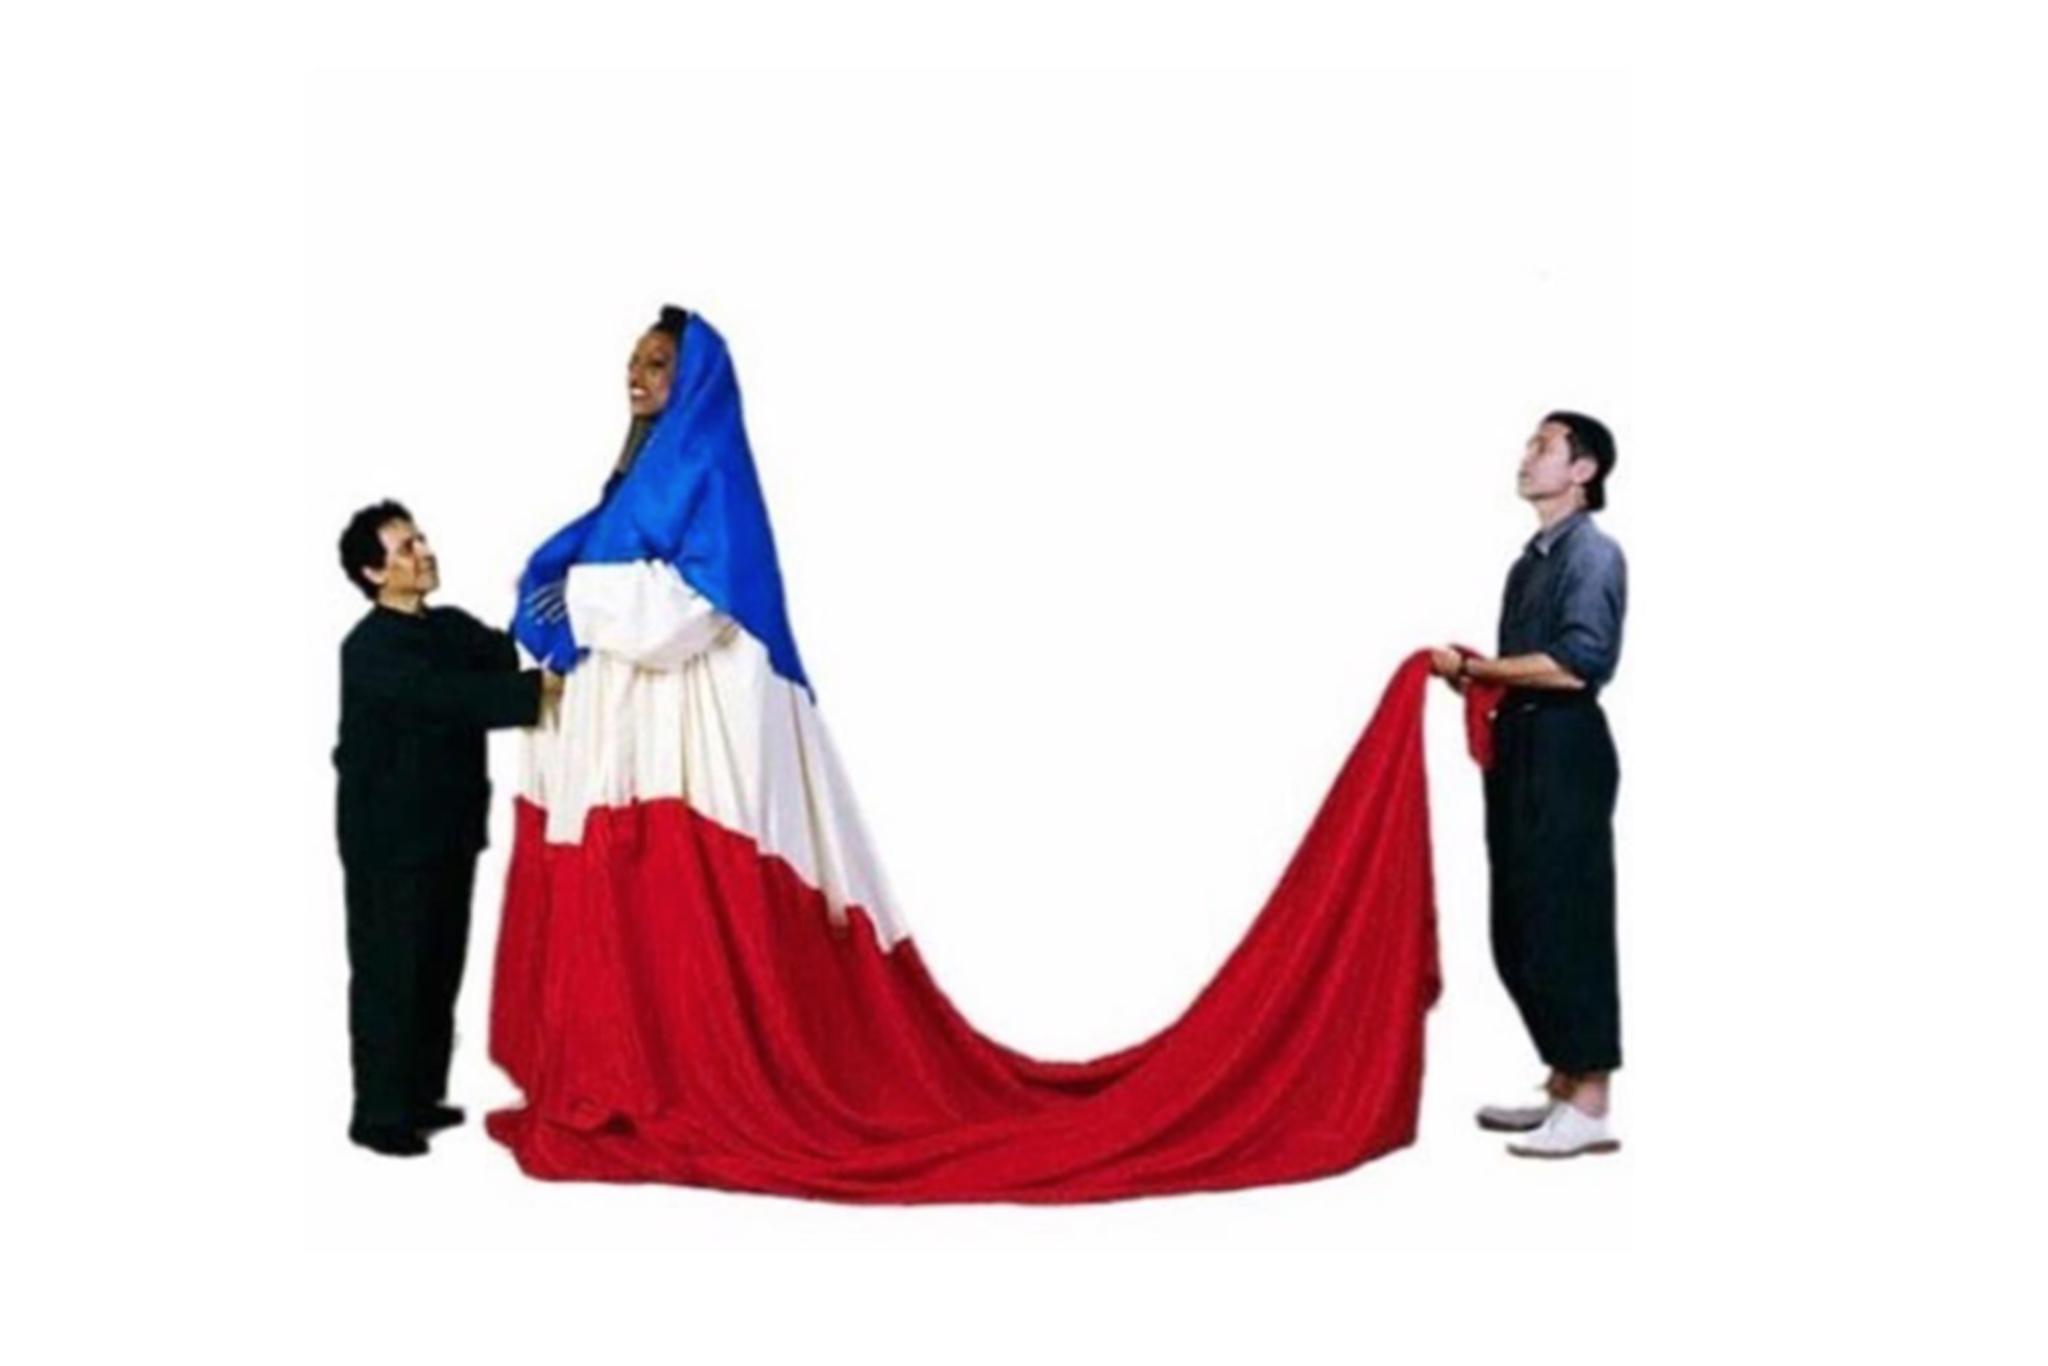 Fashion industry celebrates Macron's win